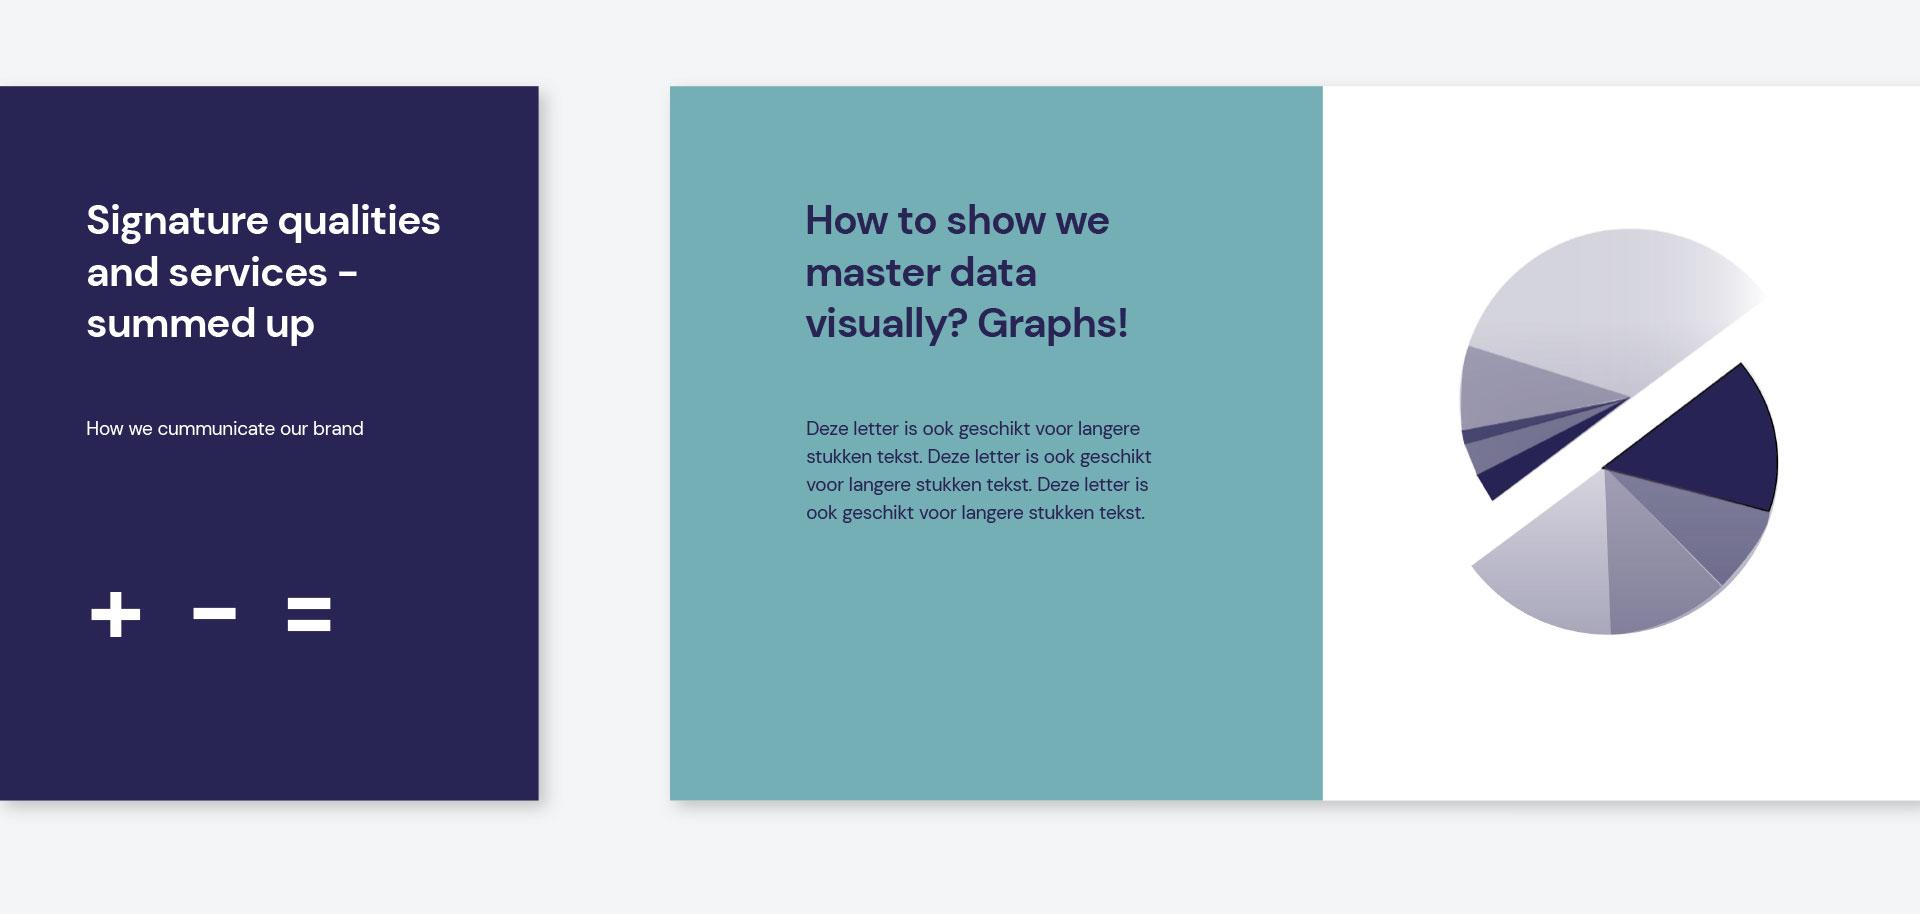 ontwerper_rotterdam_logo_branding_graphic_designer_rotterdam_sg1